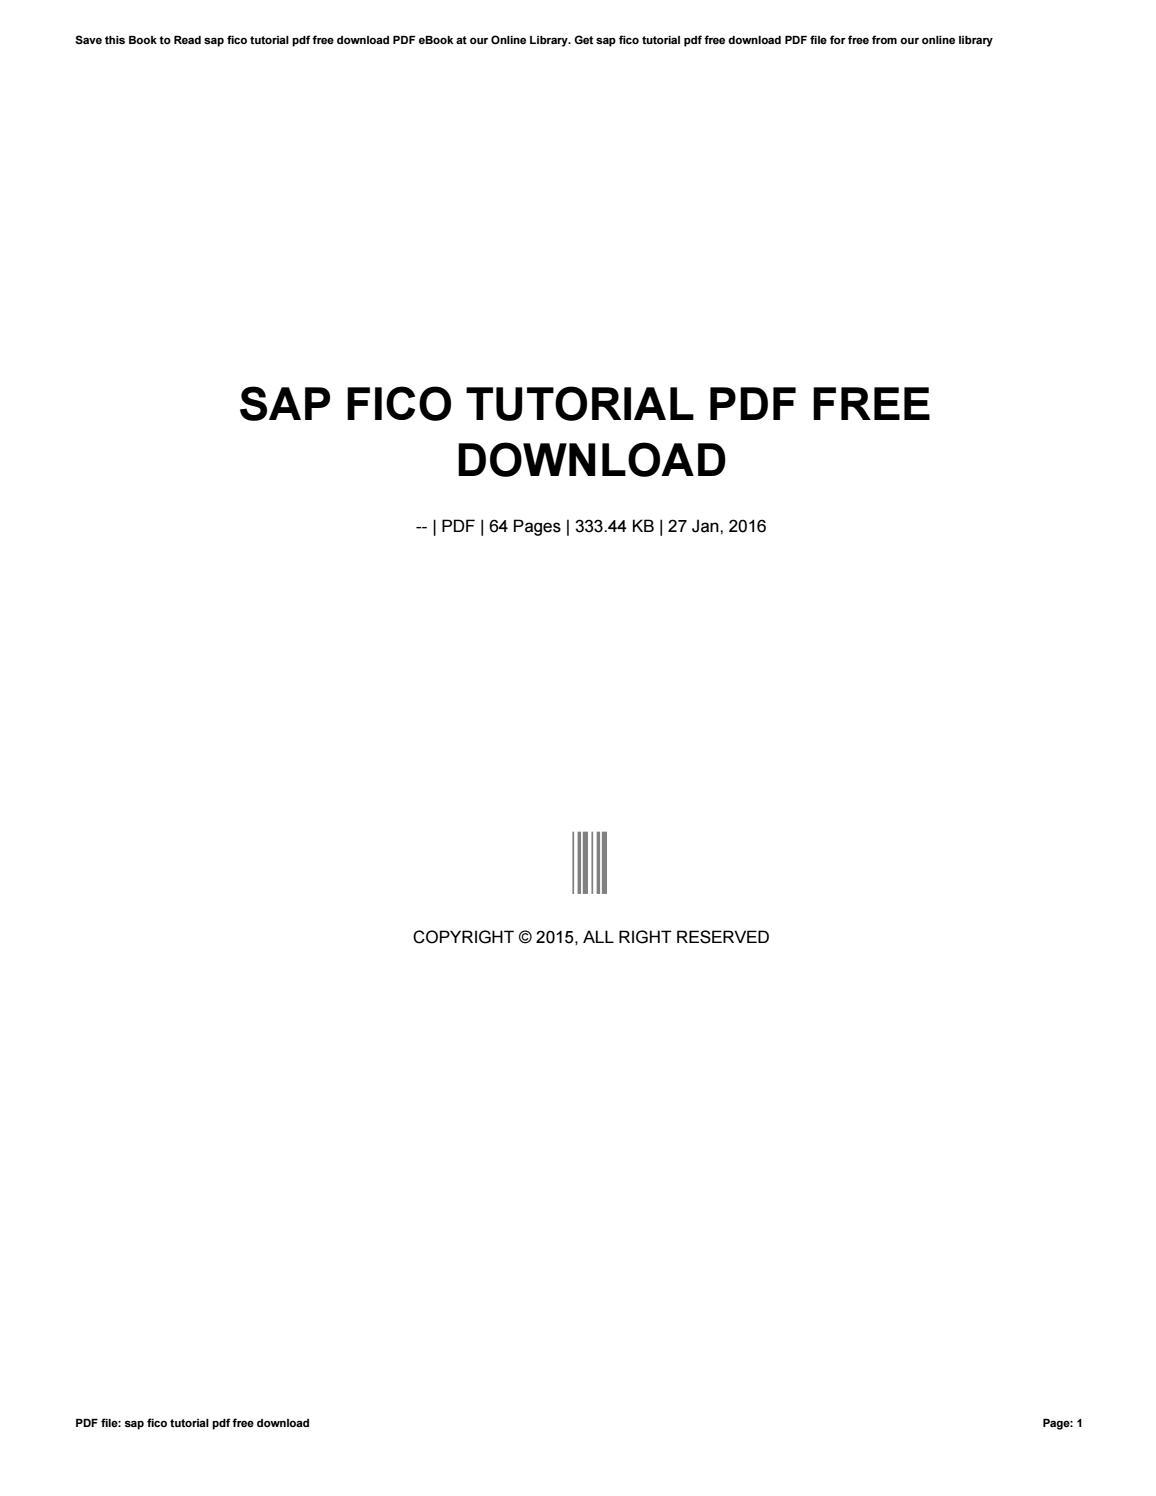 Sap fico tutorial pdf free download by sroff957 - issuu